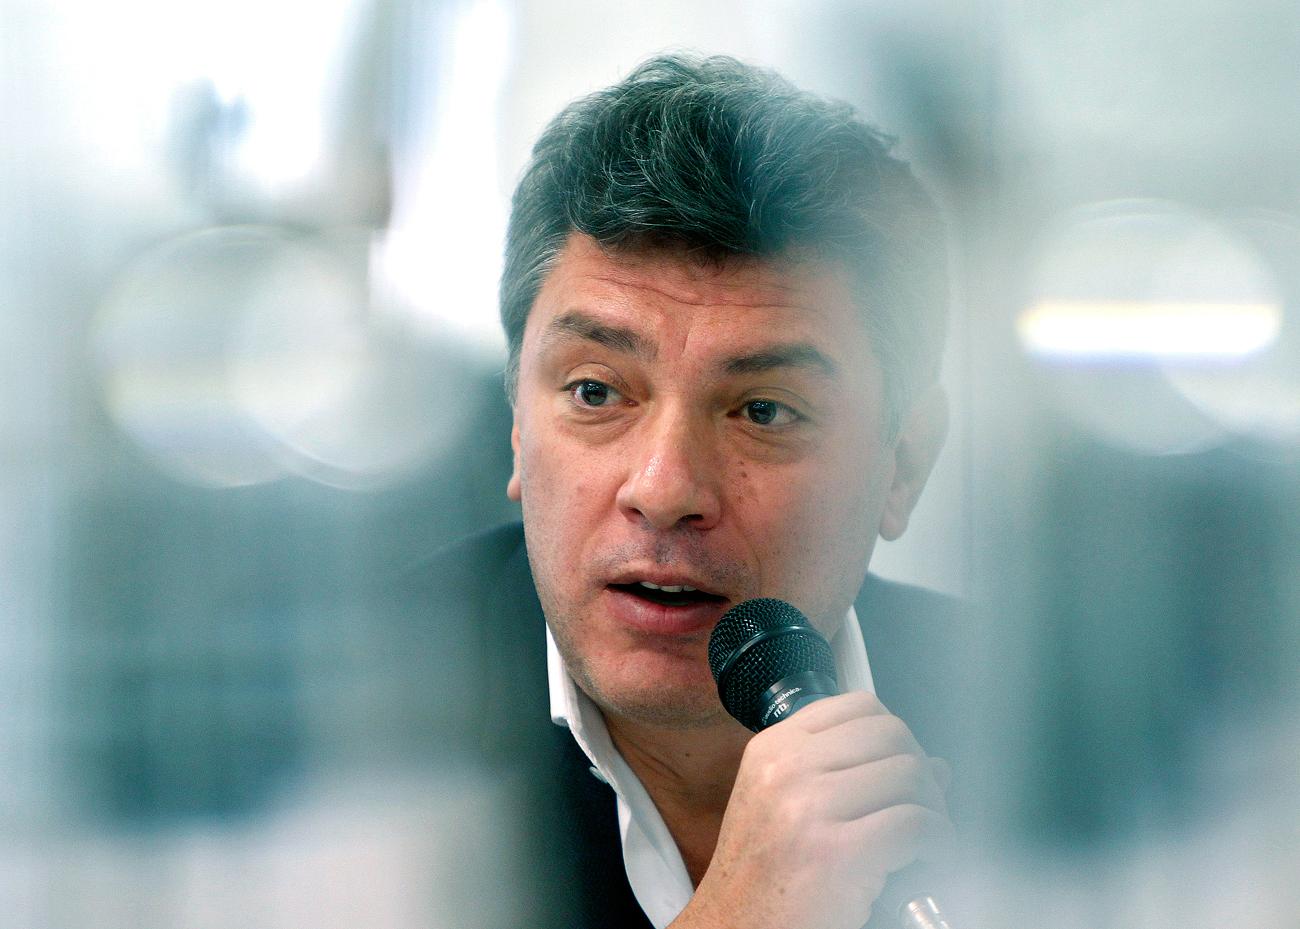 Boris Nemzow wäre am 9. Oktober 57 Jahre alt geworden.